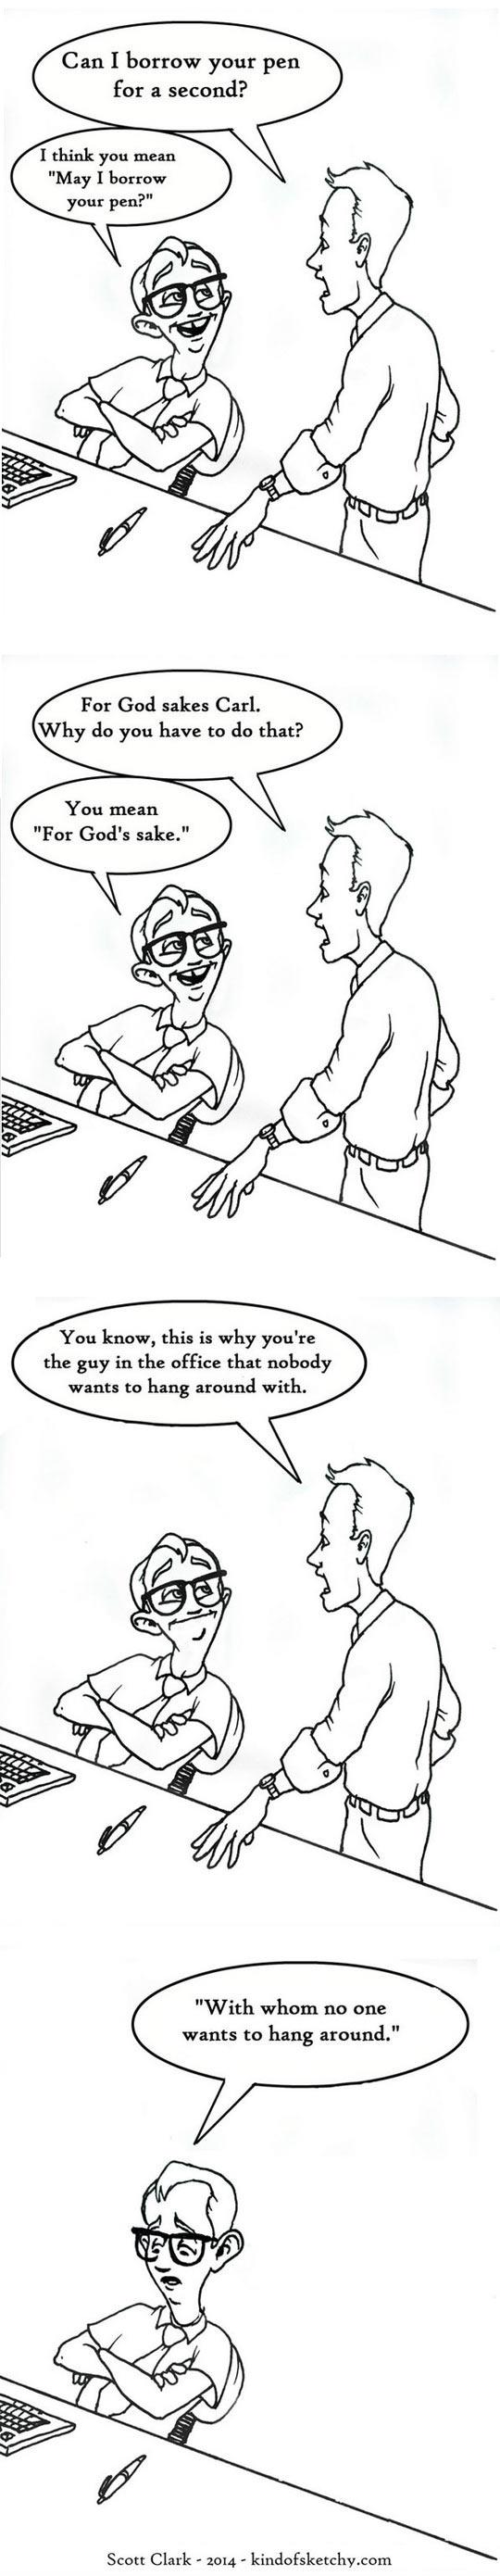 funny-man-office-grammar-comic